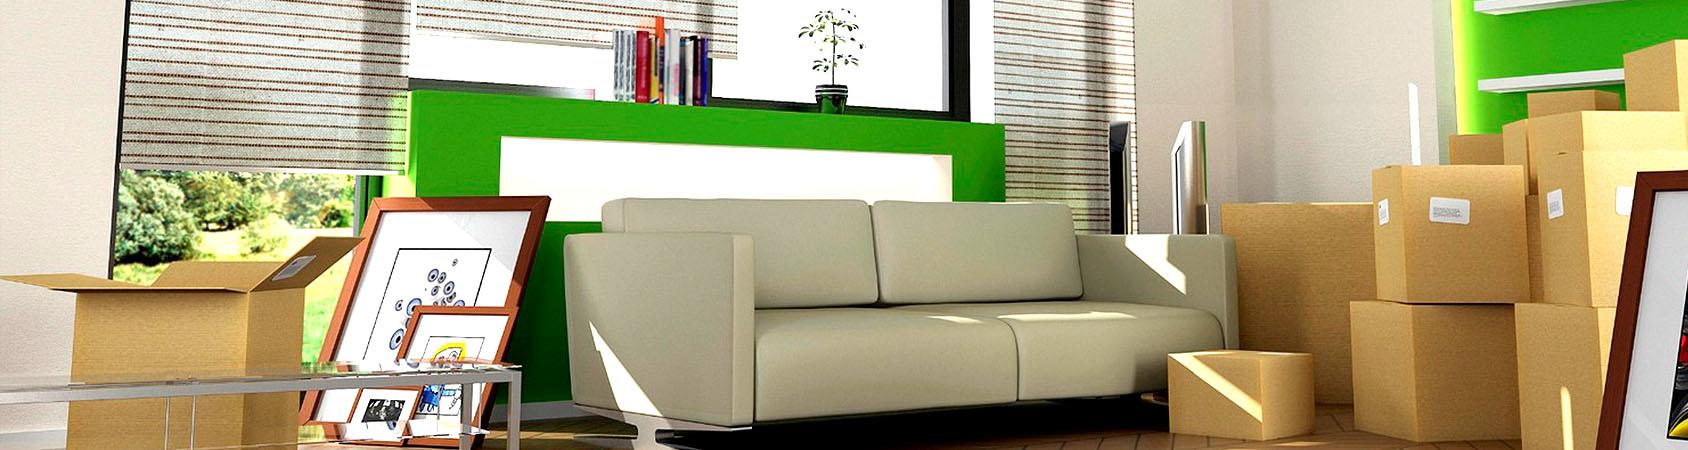 sipan umzug gmbh umzug reinigung entsorgung. Black Bedroom Furniture Sets. Home Design Ideas